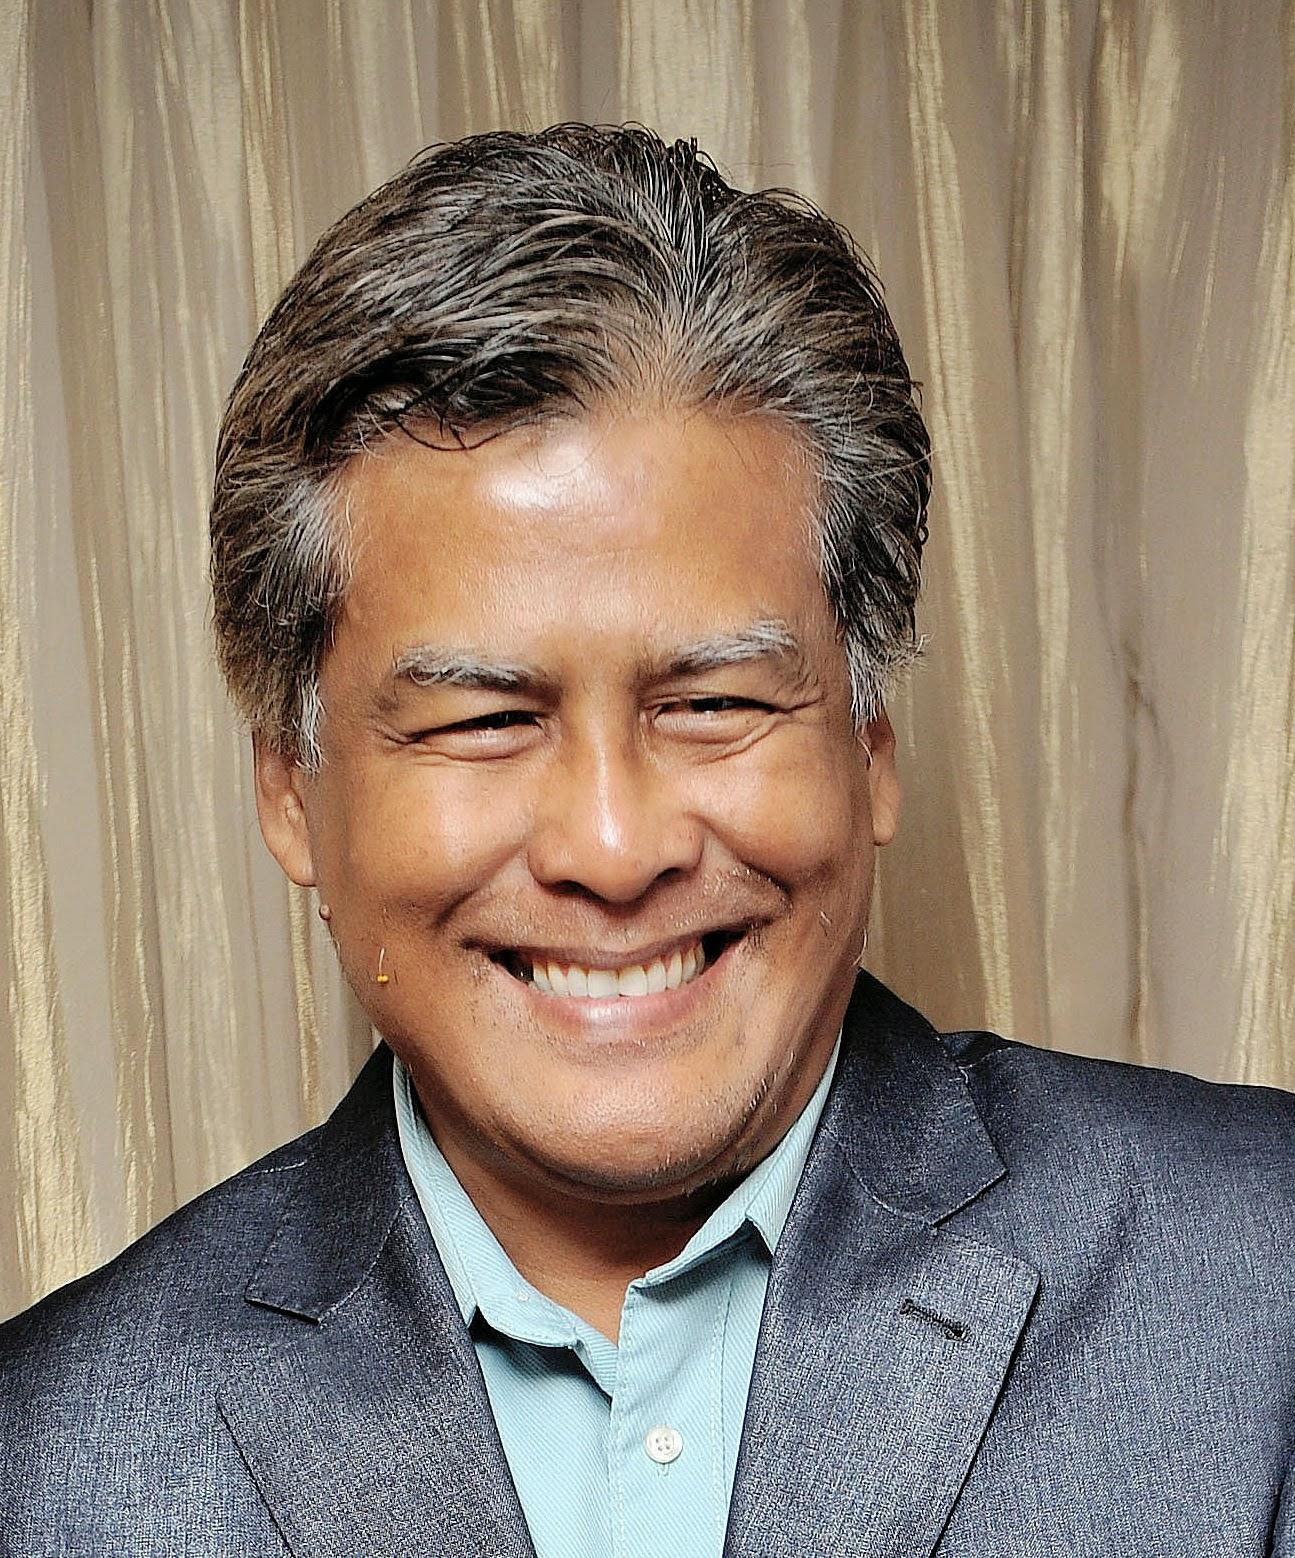 Dato Jalaluddin Hassan Rebah Di Tanah Kubur, info, terkini, hiburan, pelakon, Datuk Jalaluddin Hassan